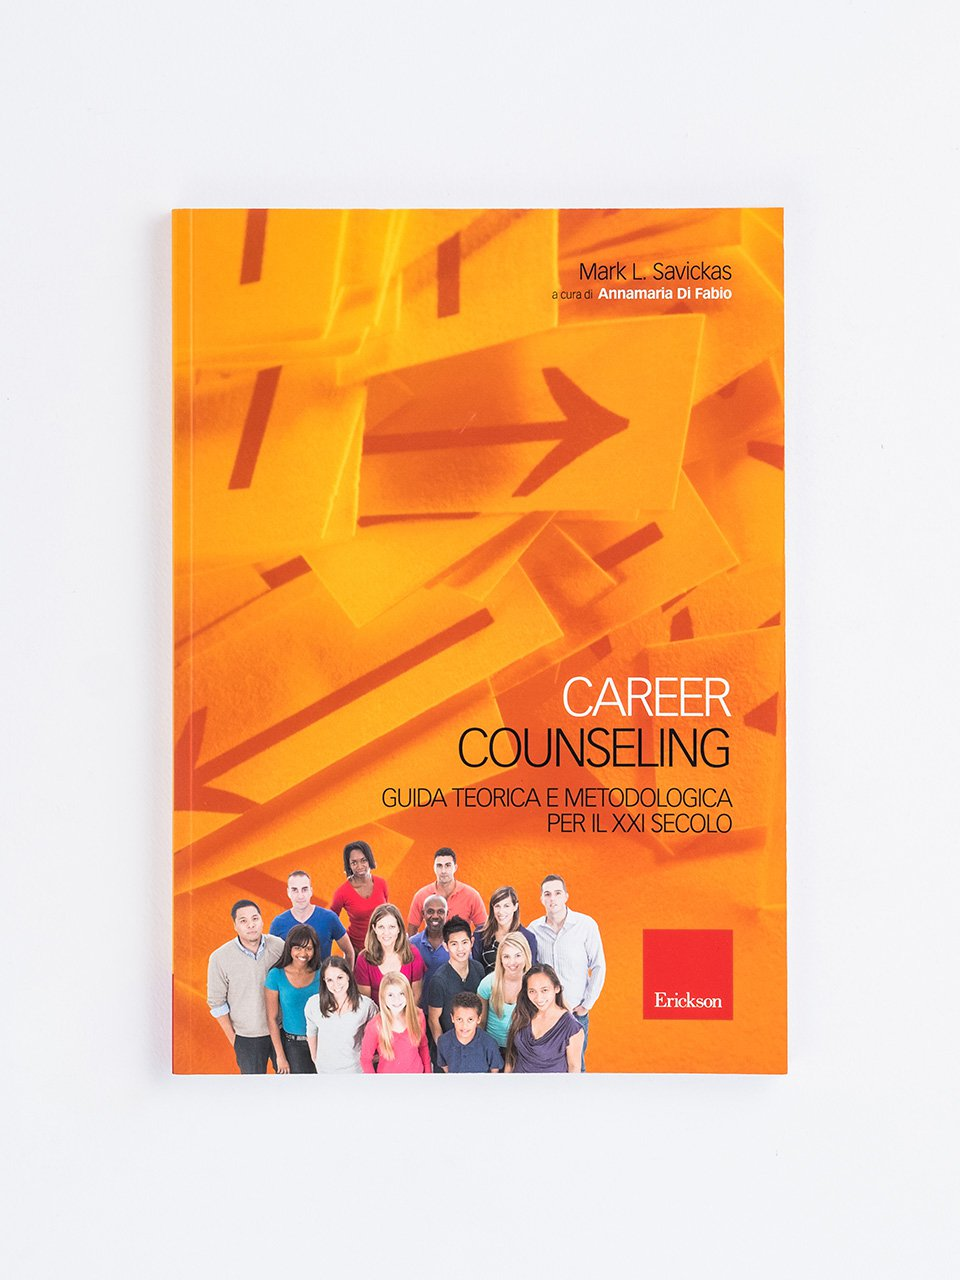 Career counseling - Terapista Occupazionale - Erickson